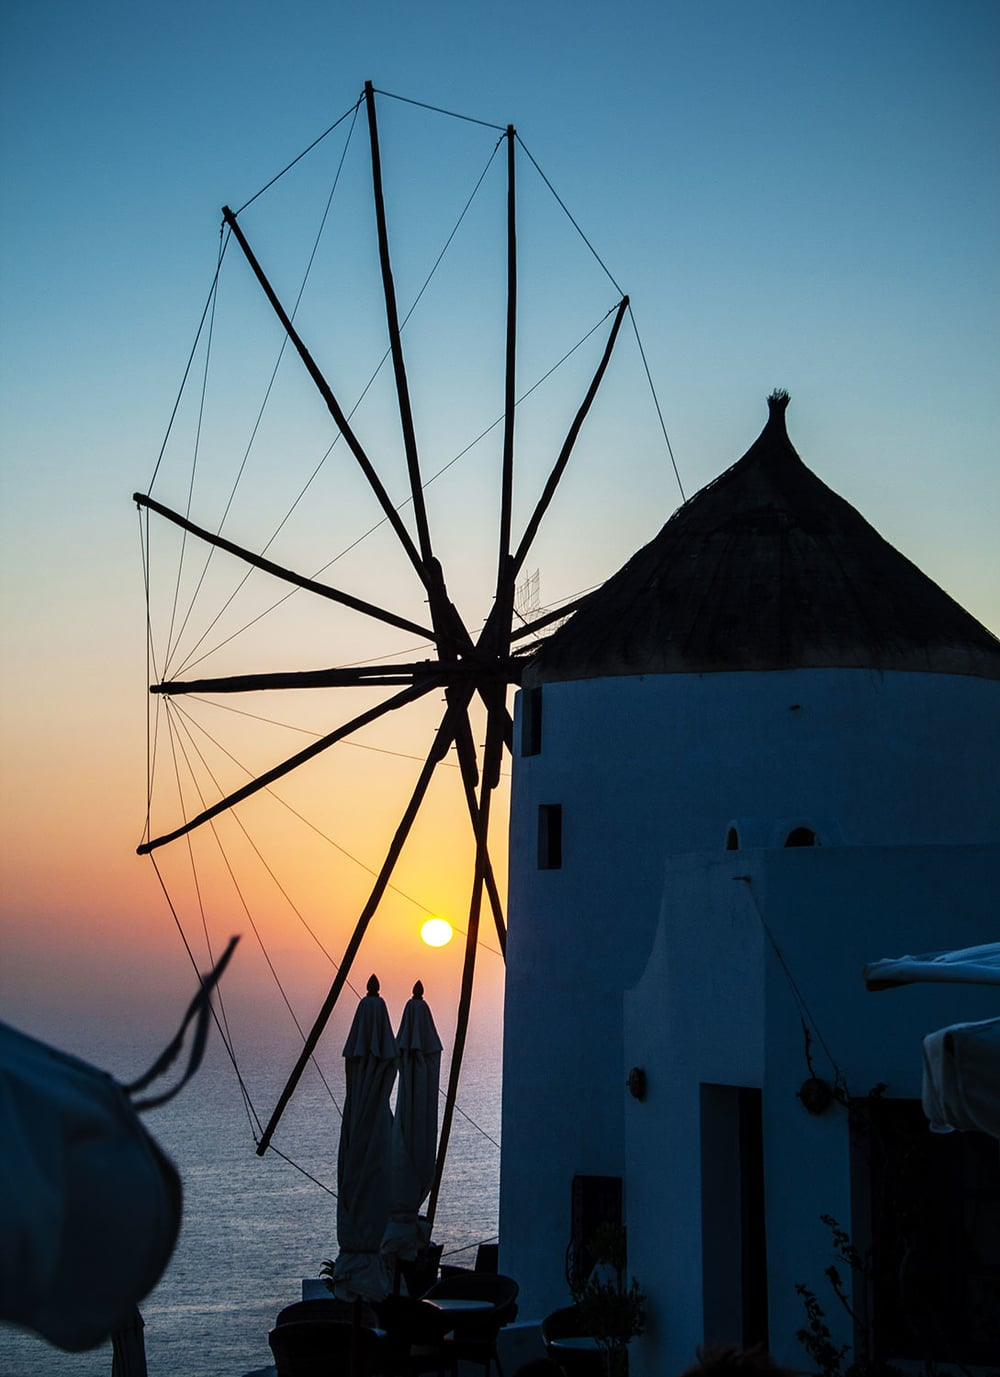 santorini_windmill.jpg